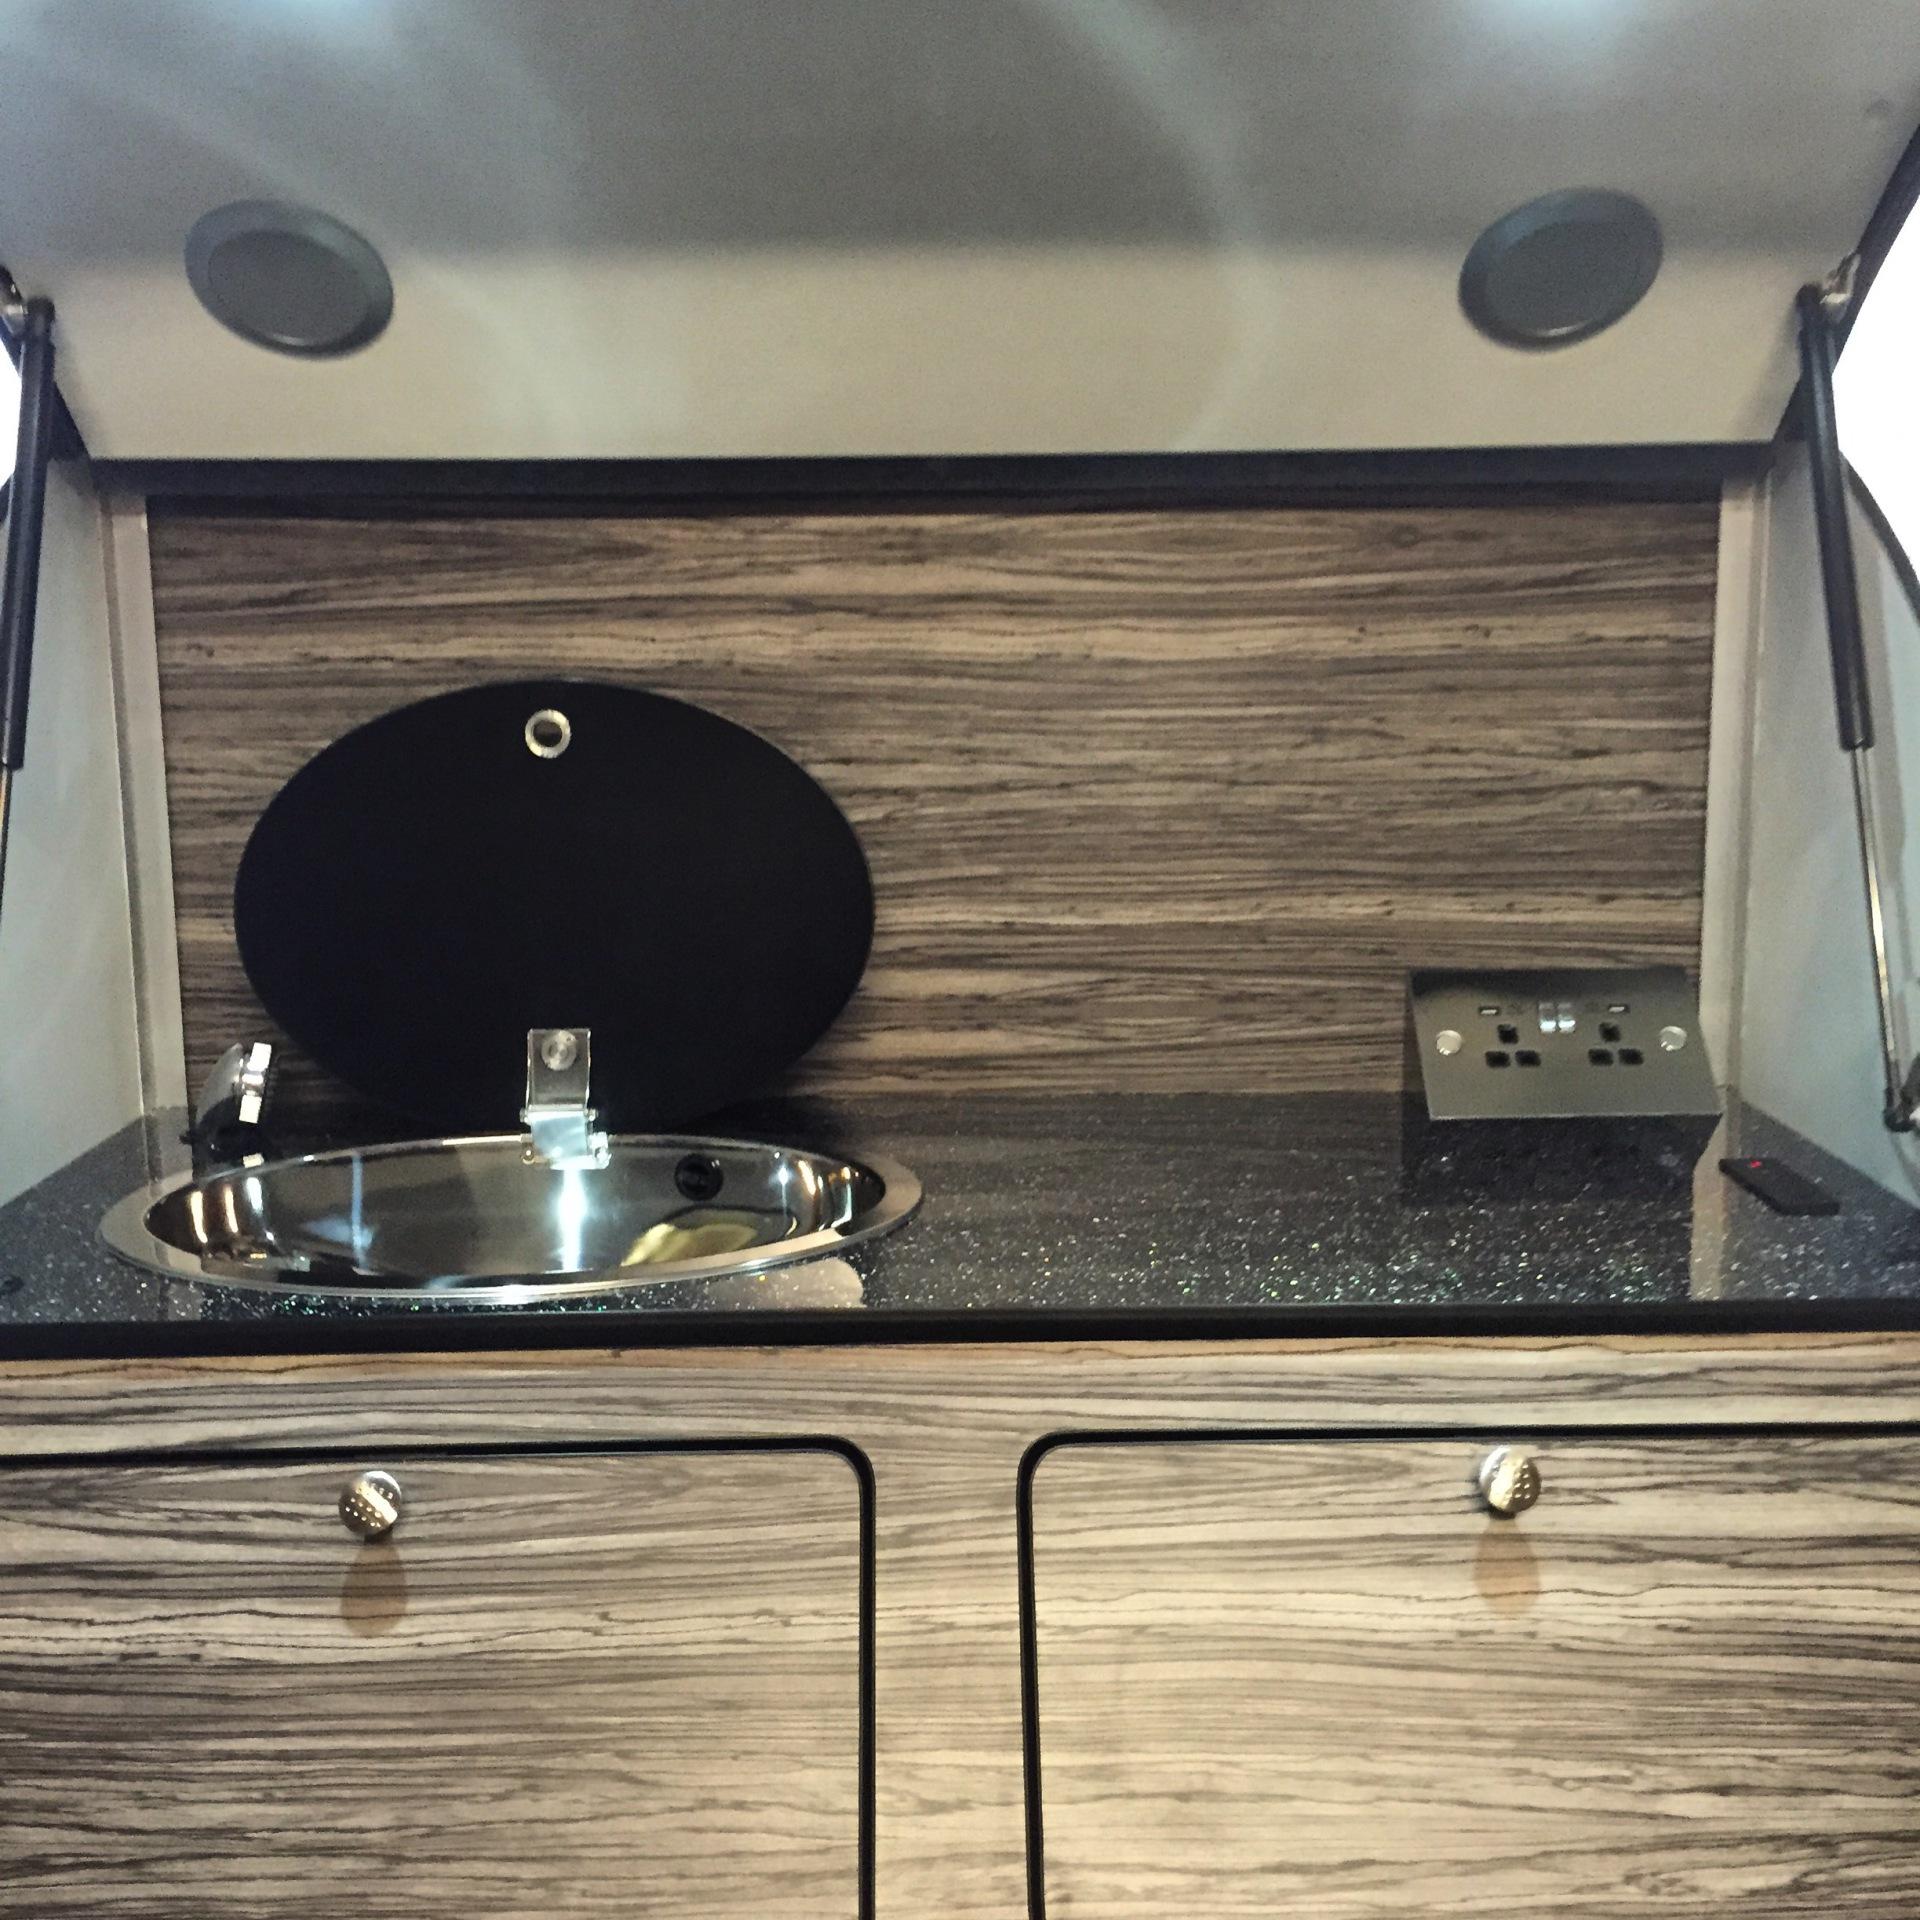 teardrop trailer, camping,camper van, caravan